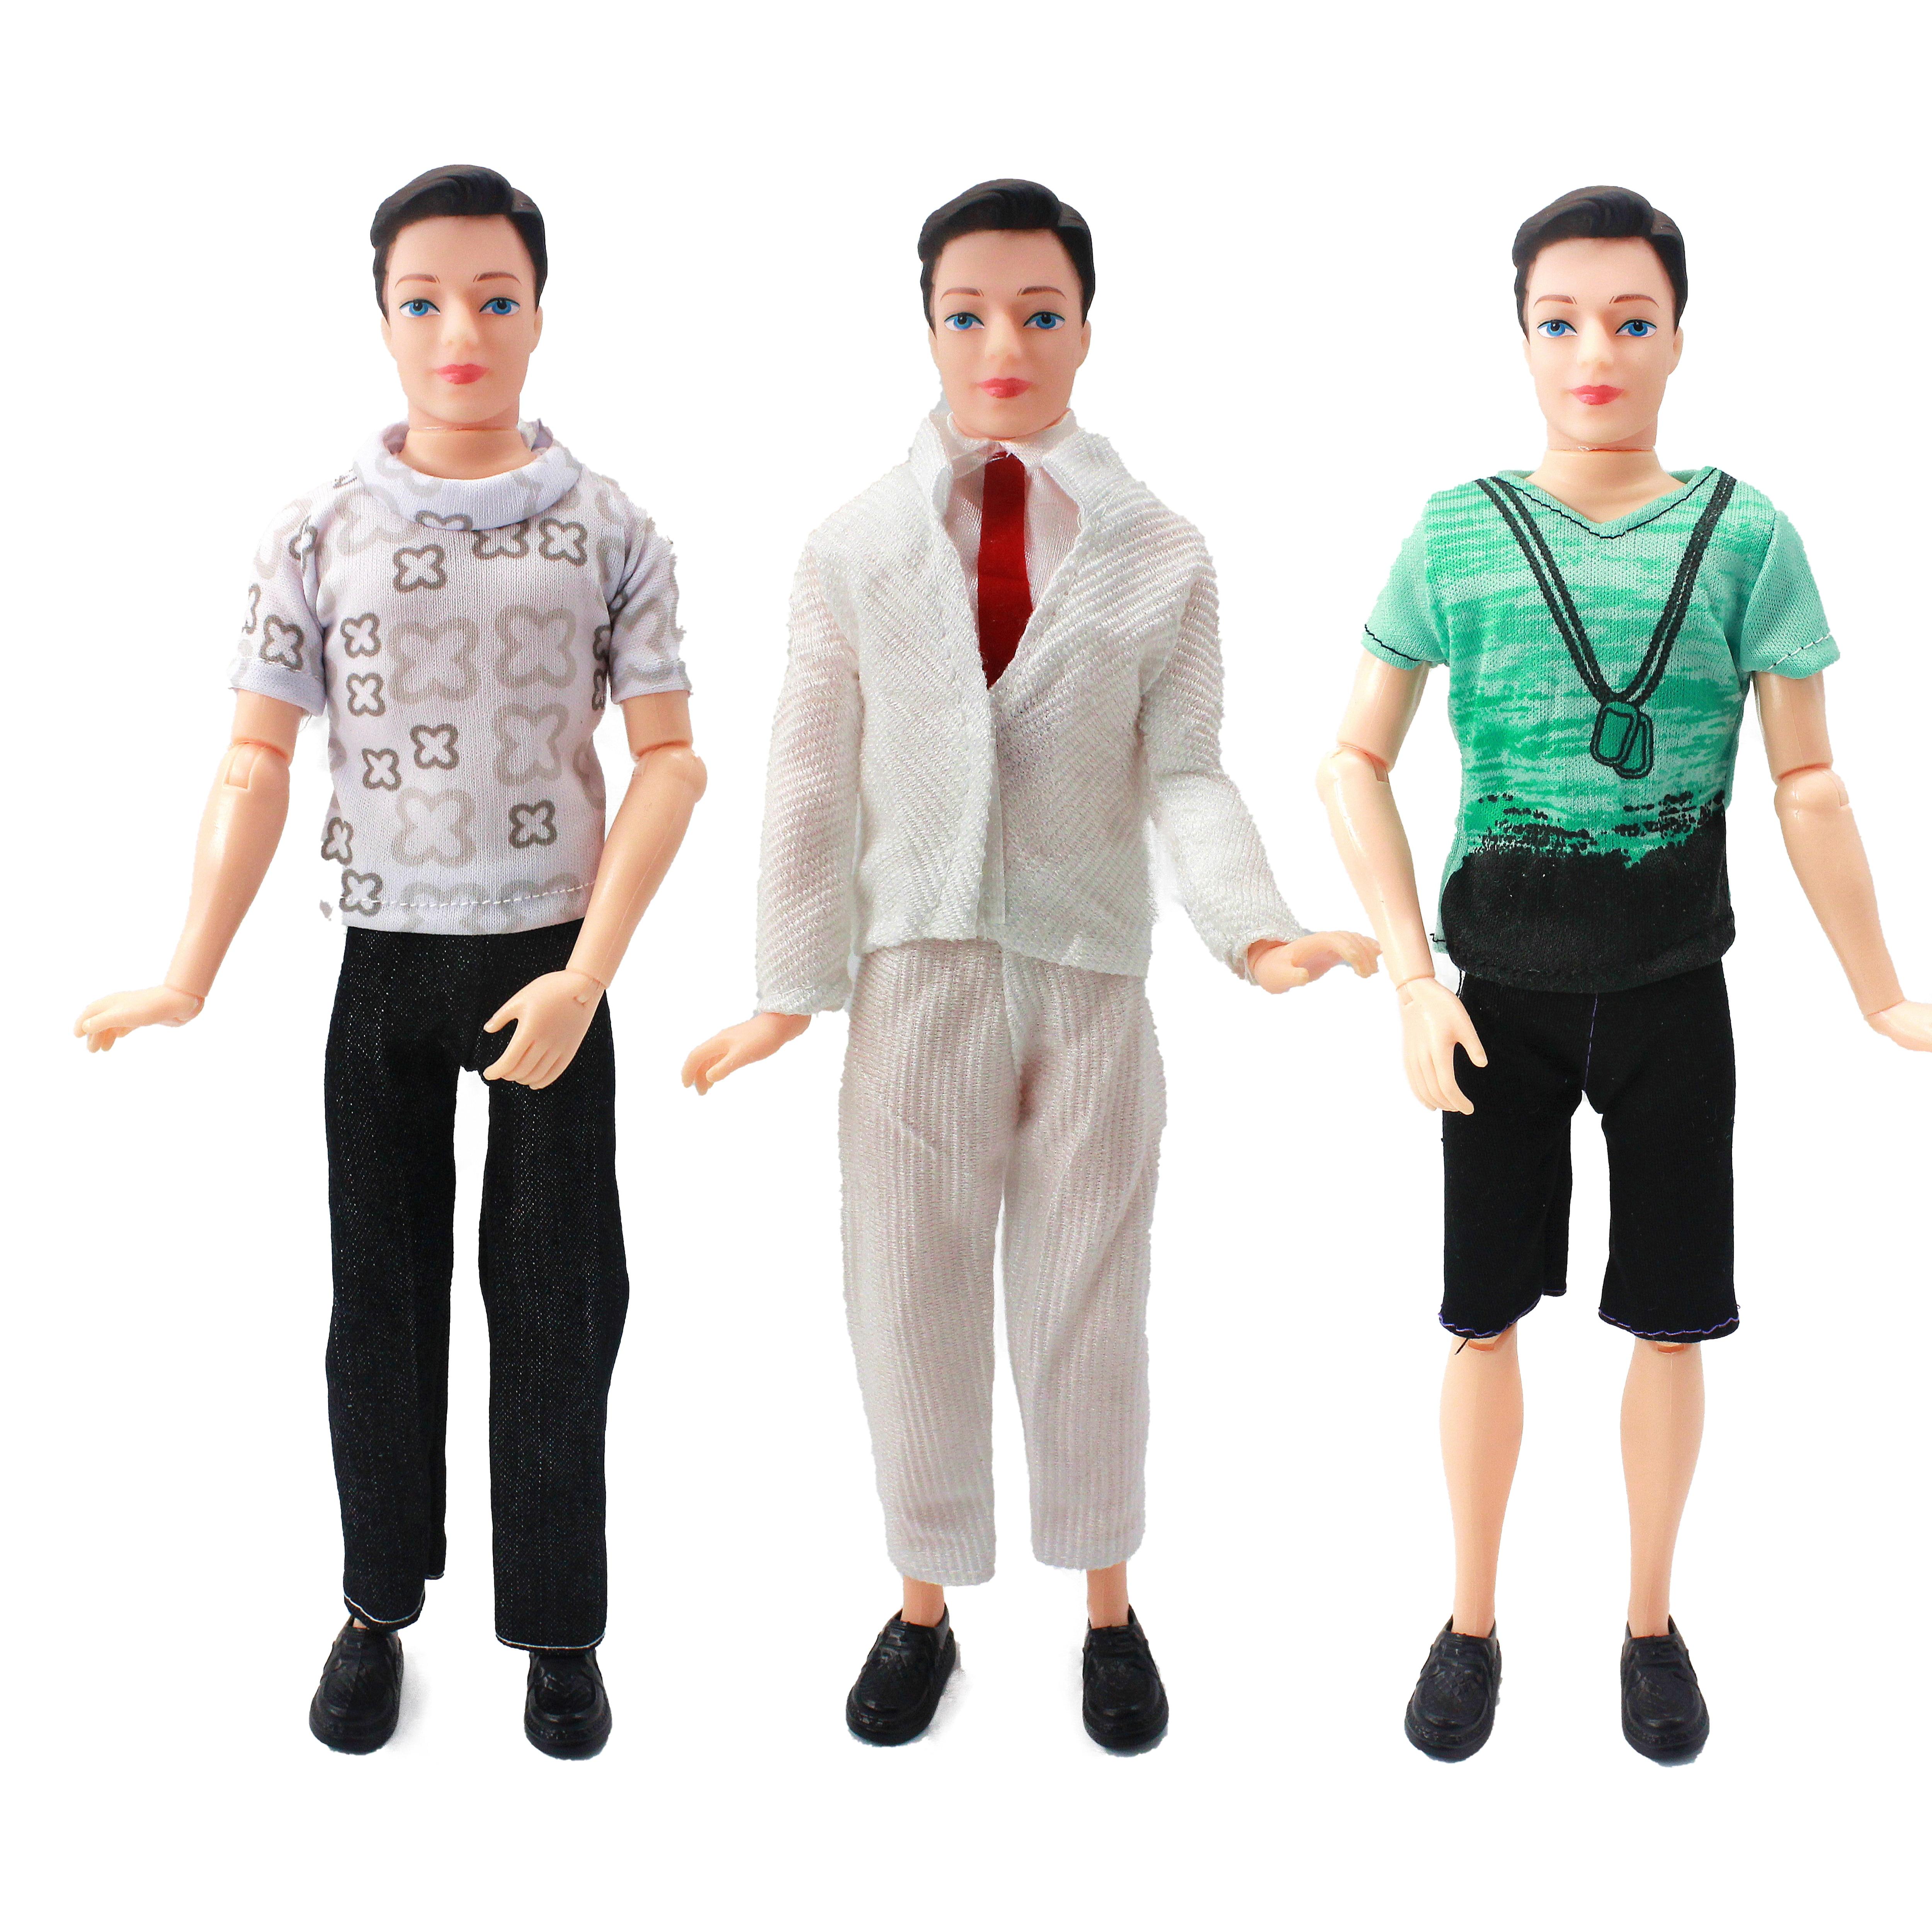 Juguetes para niñas 1 muñeca de moda masculina, cuerpo de muñeca +...